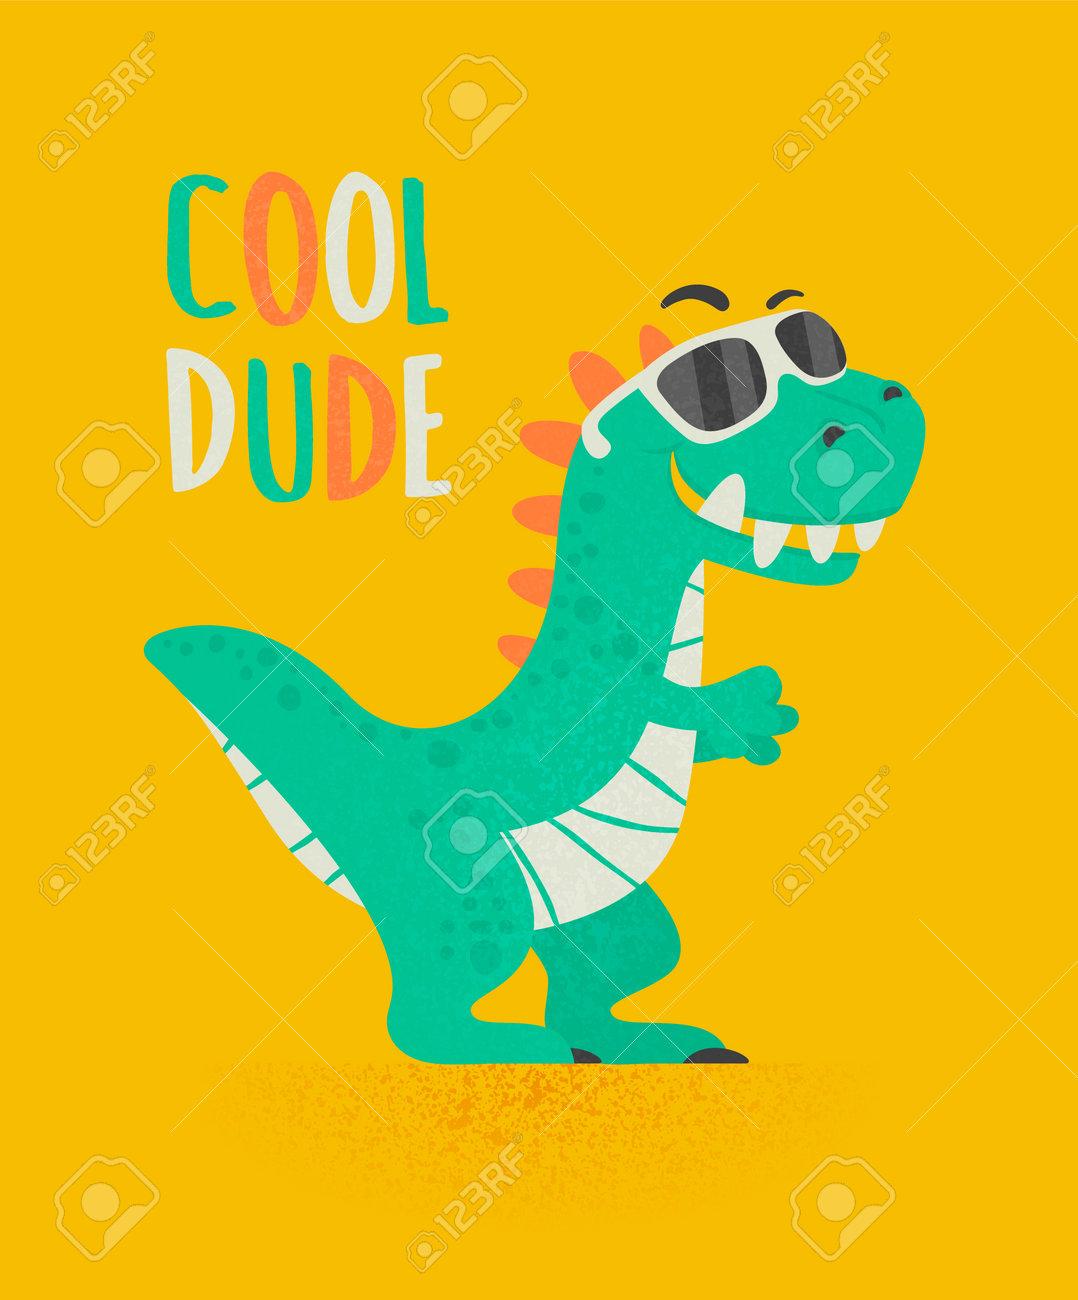 Cool Dude Dinosaur Tirannosaur Three Rex. Cartoon Tirex. Card for a Child. Vector Cute and Funny Cartoon Hand Drawn Dinosaur with Sunglassess, Children s Illustration, Print for Kids - 172733969